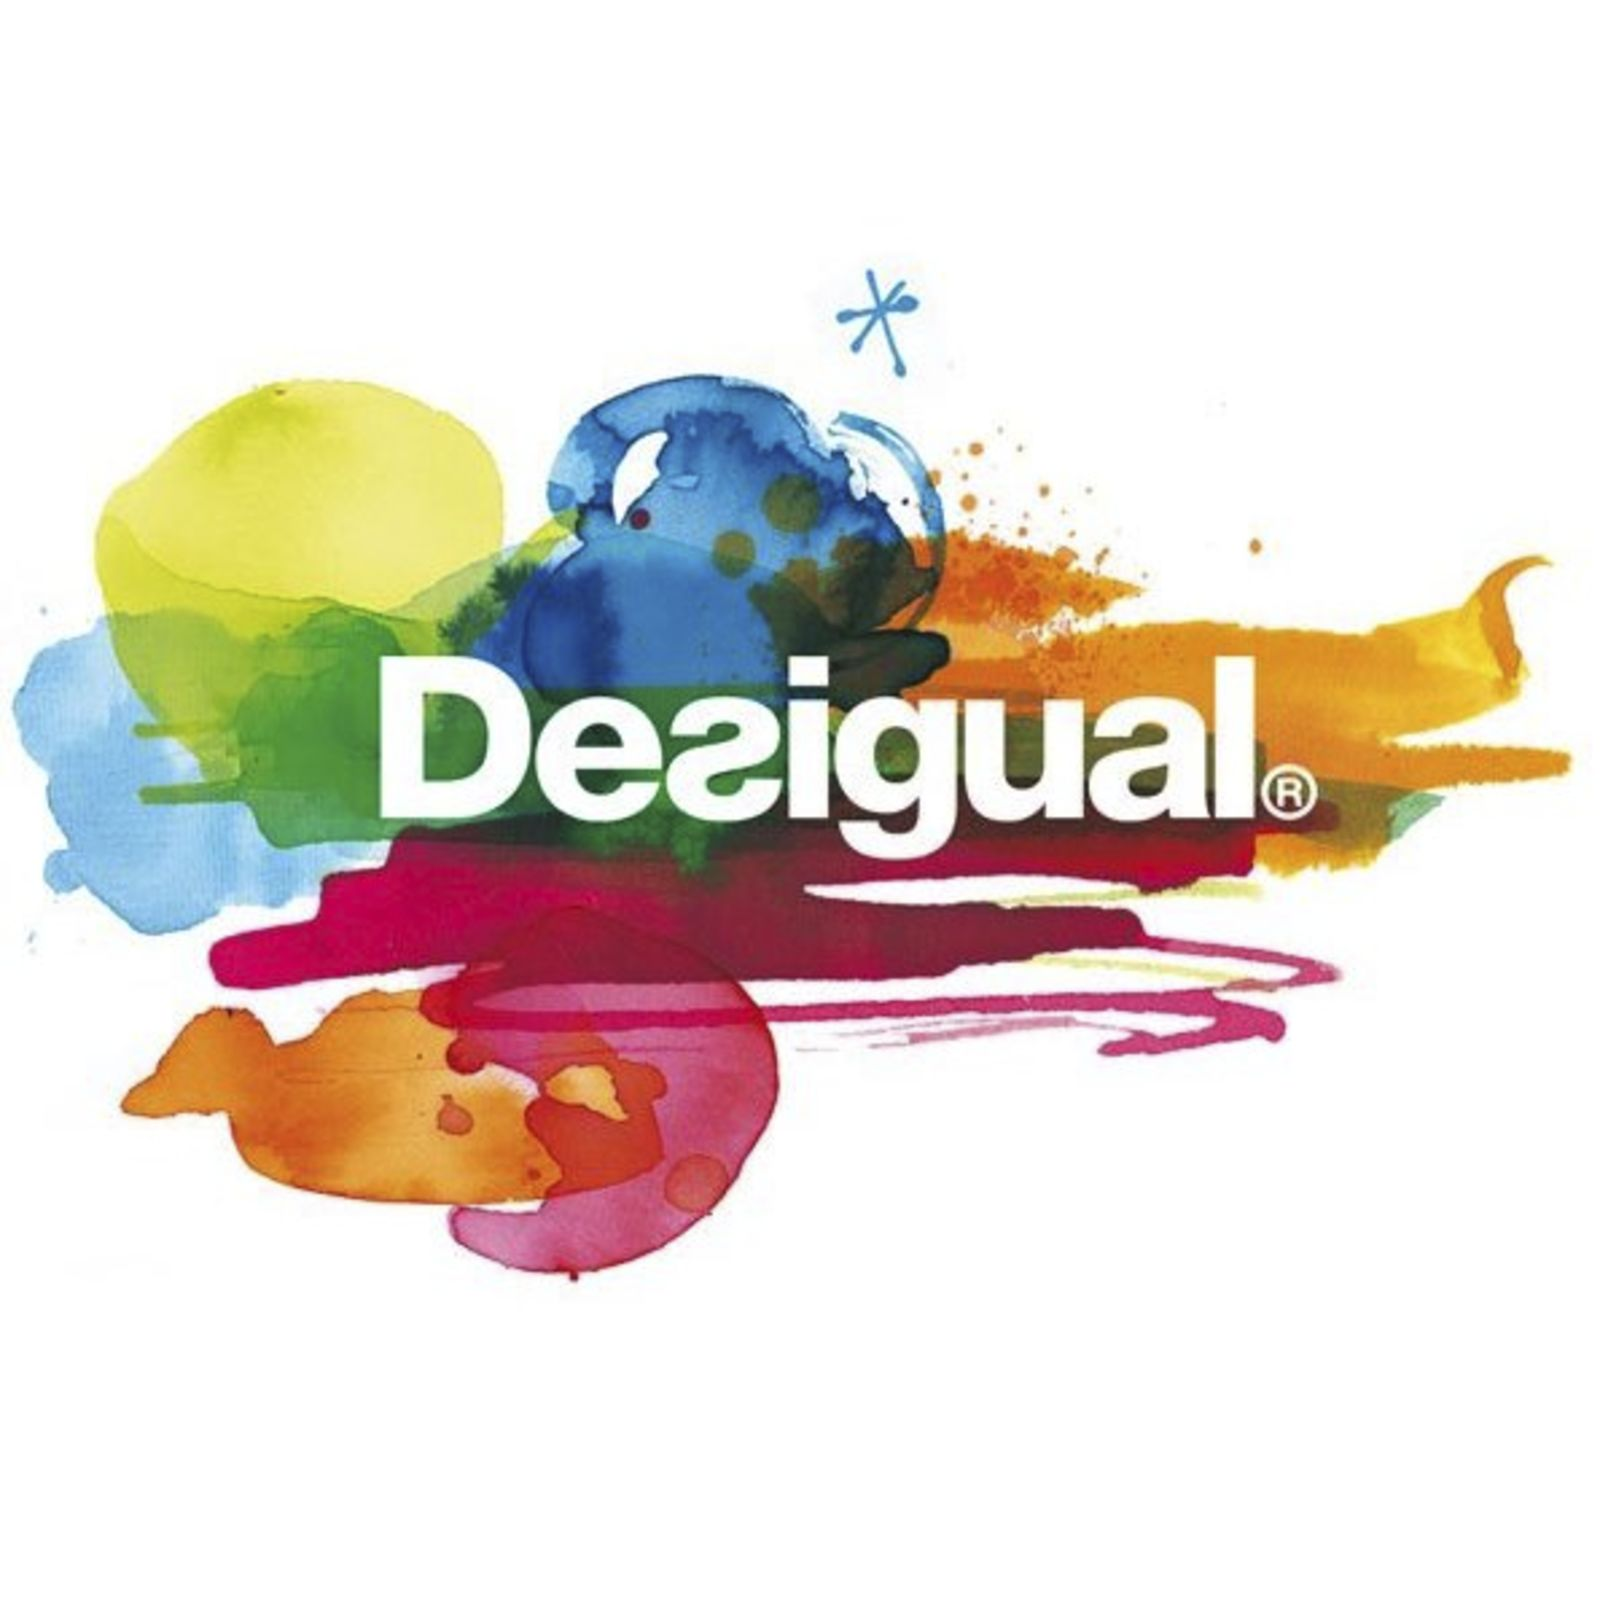 Desigual (Image 1)